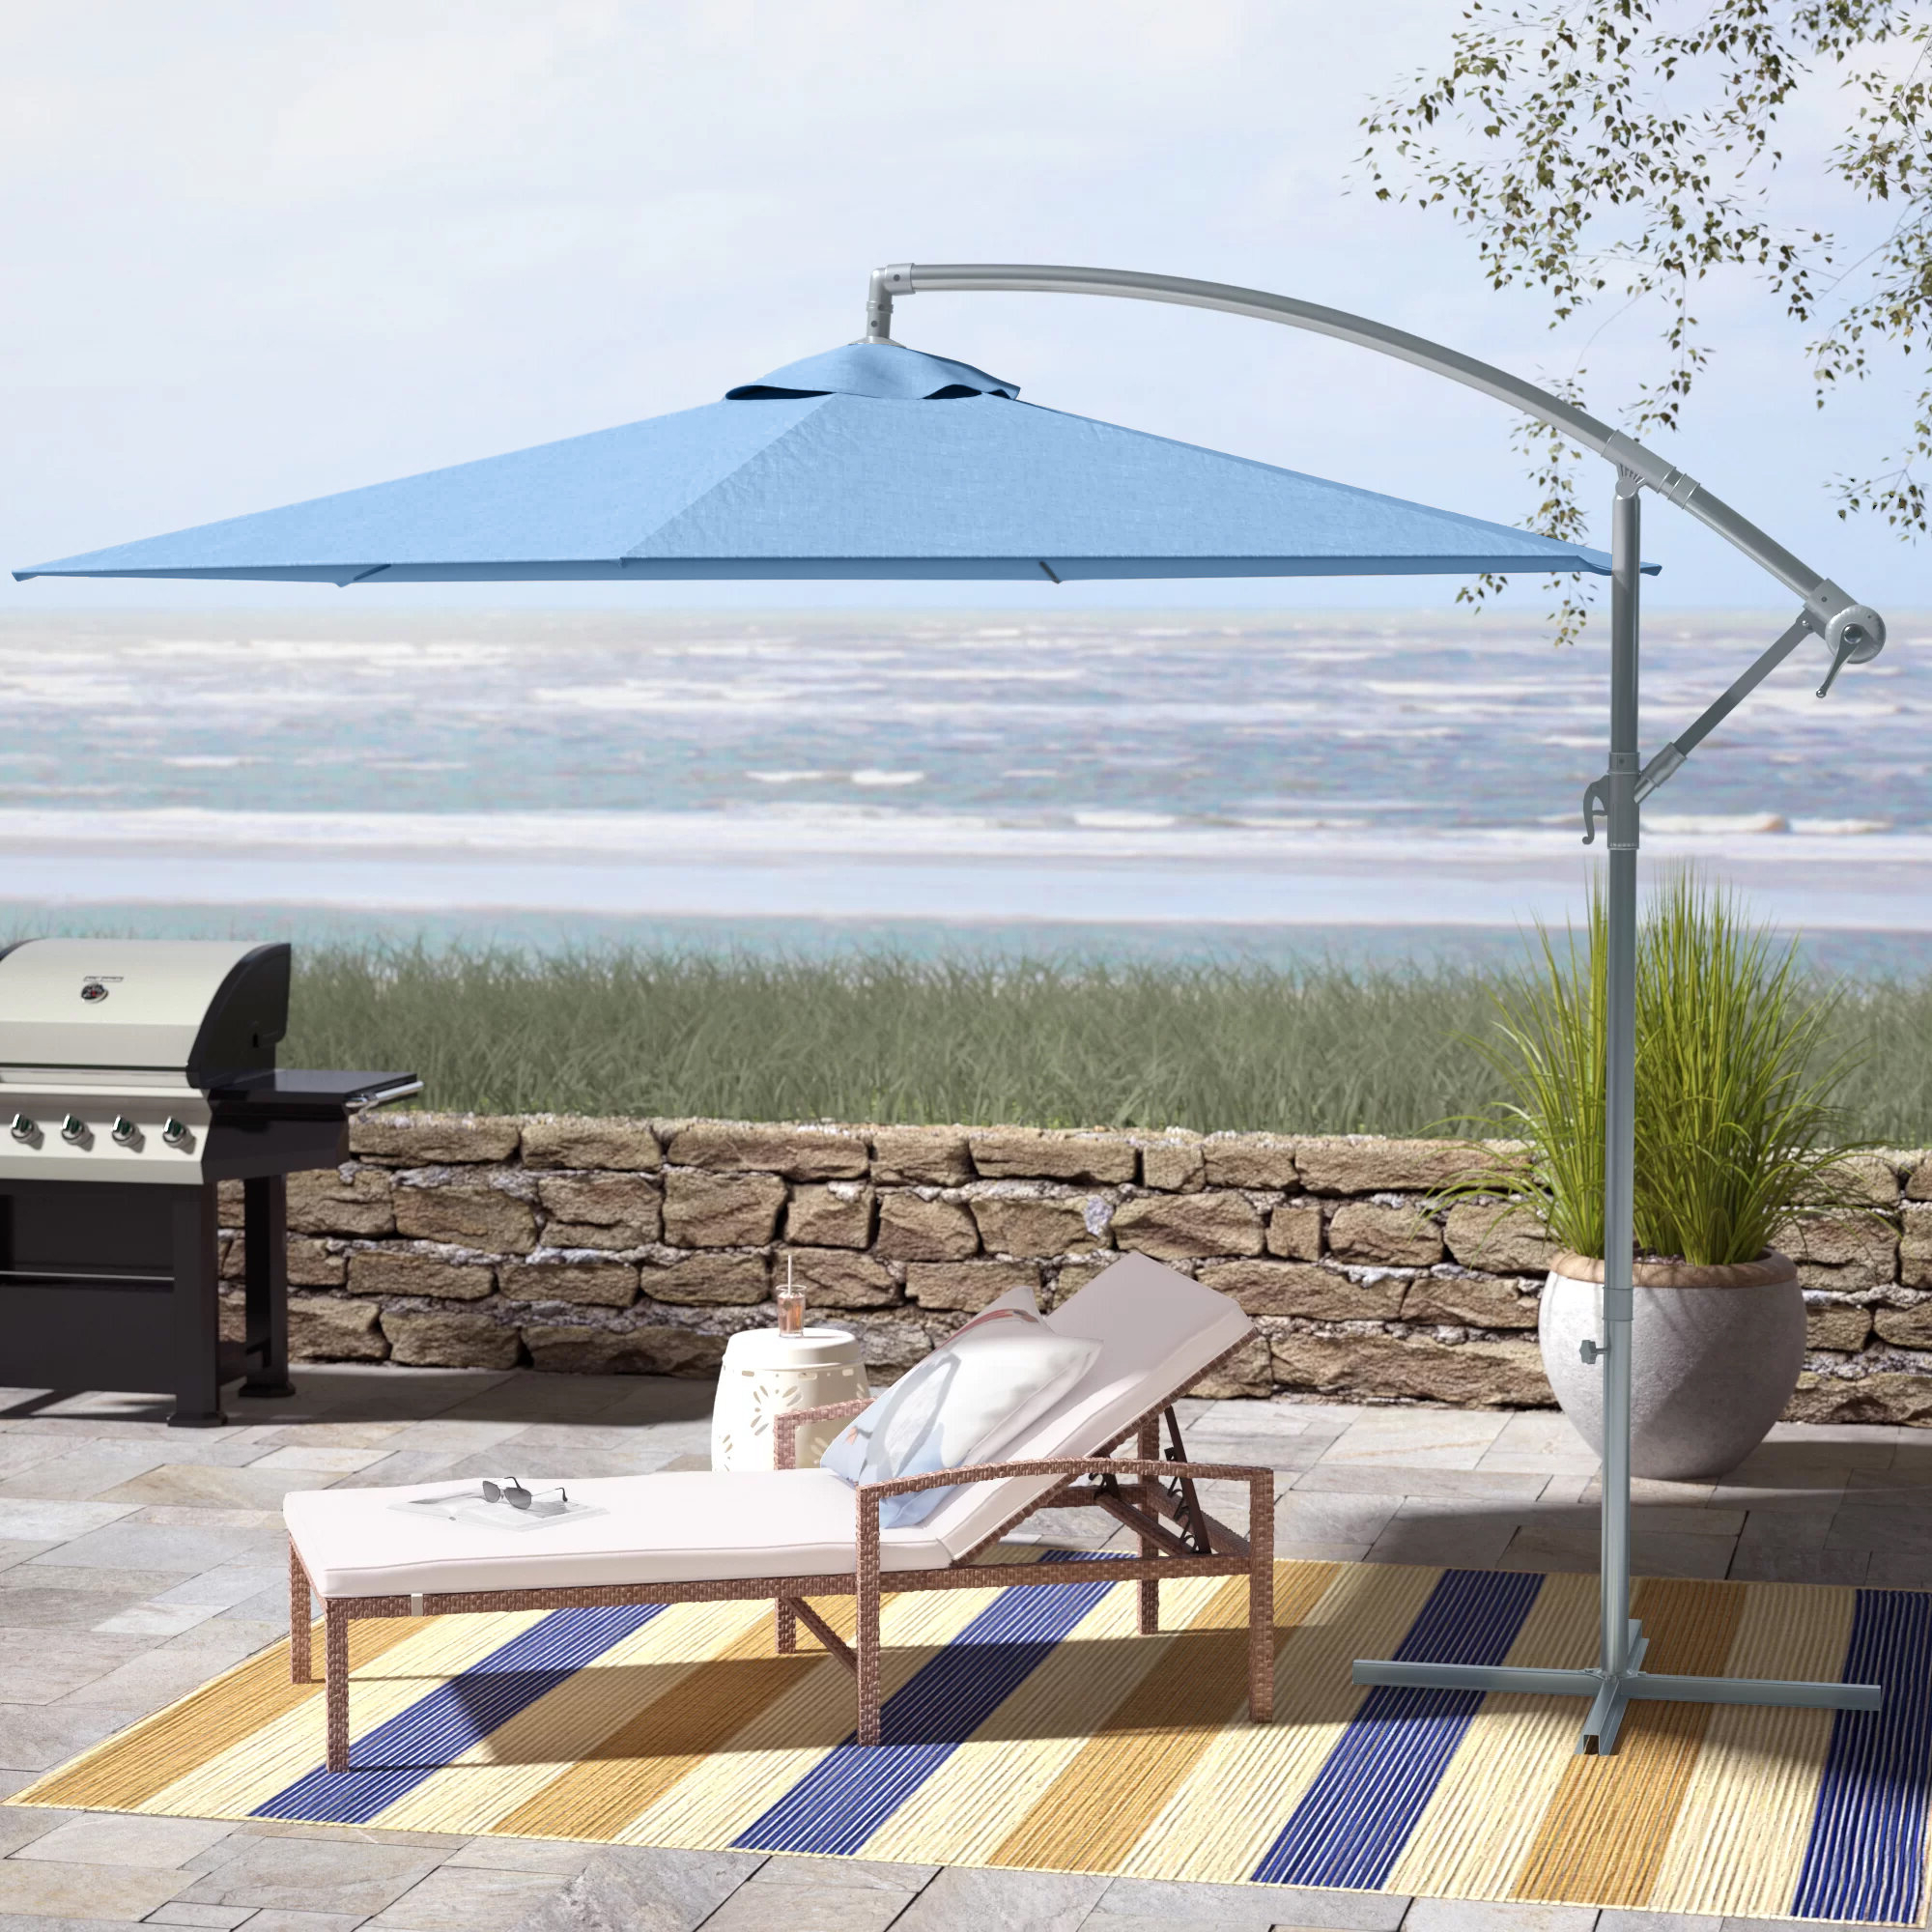 Muhammad Fullerton 10' Cantilever Umbrella Regarding Widely Used Vassalboro Cantilever Umbrellas (Gallery 13 of 20)